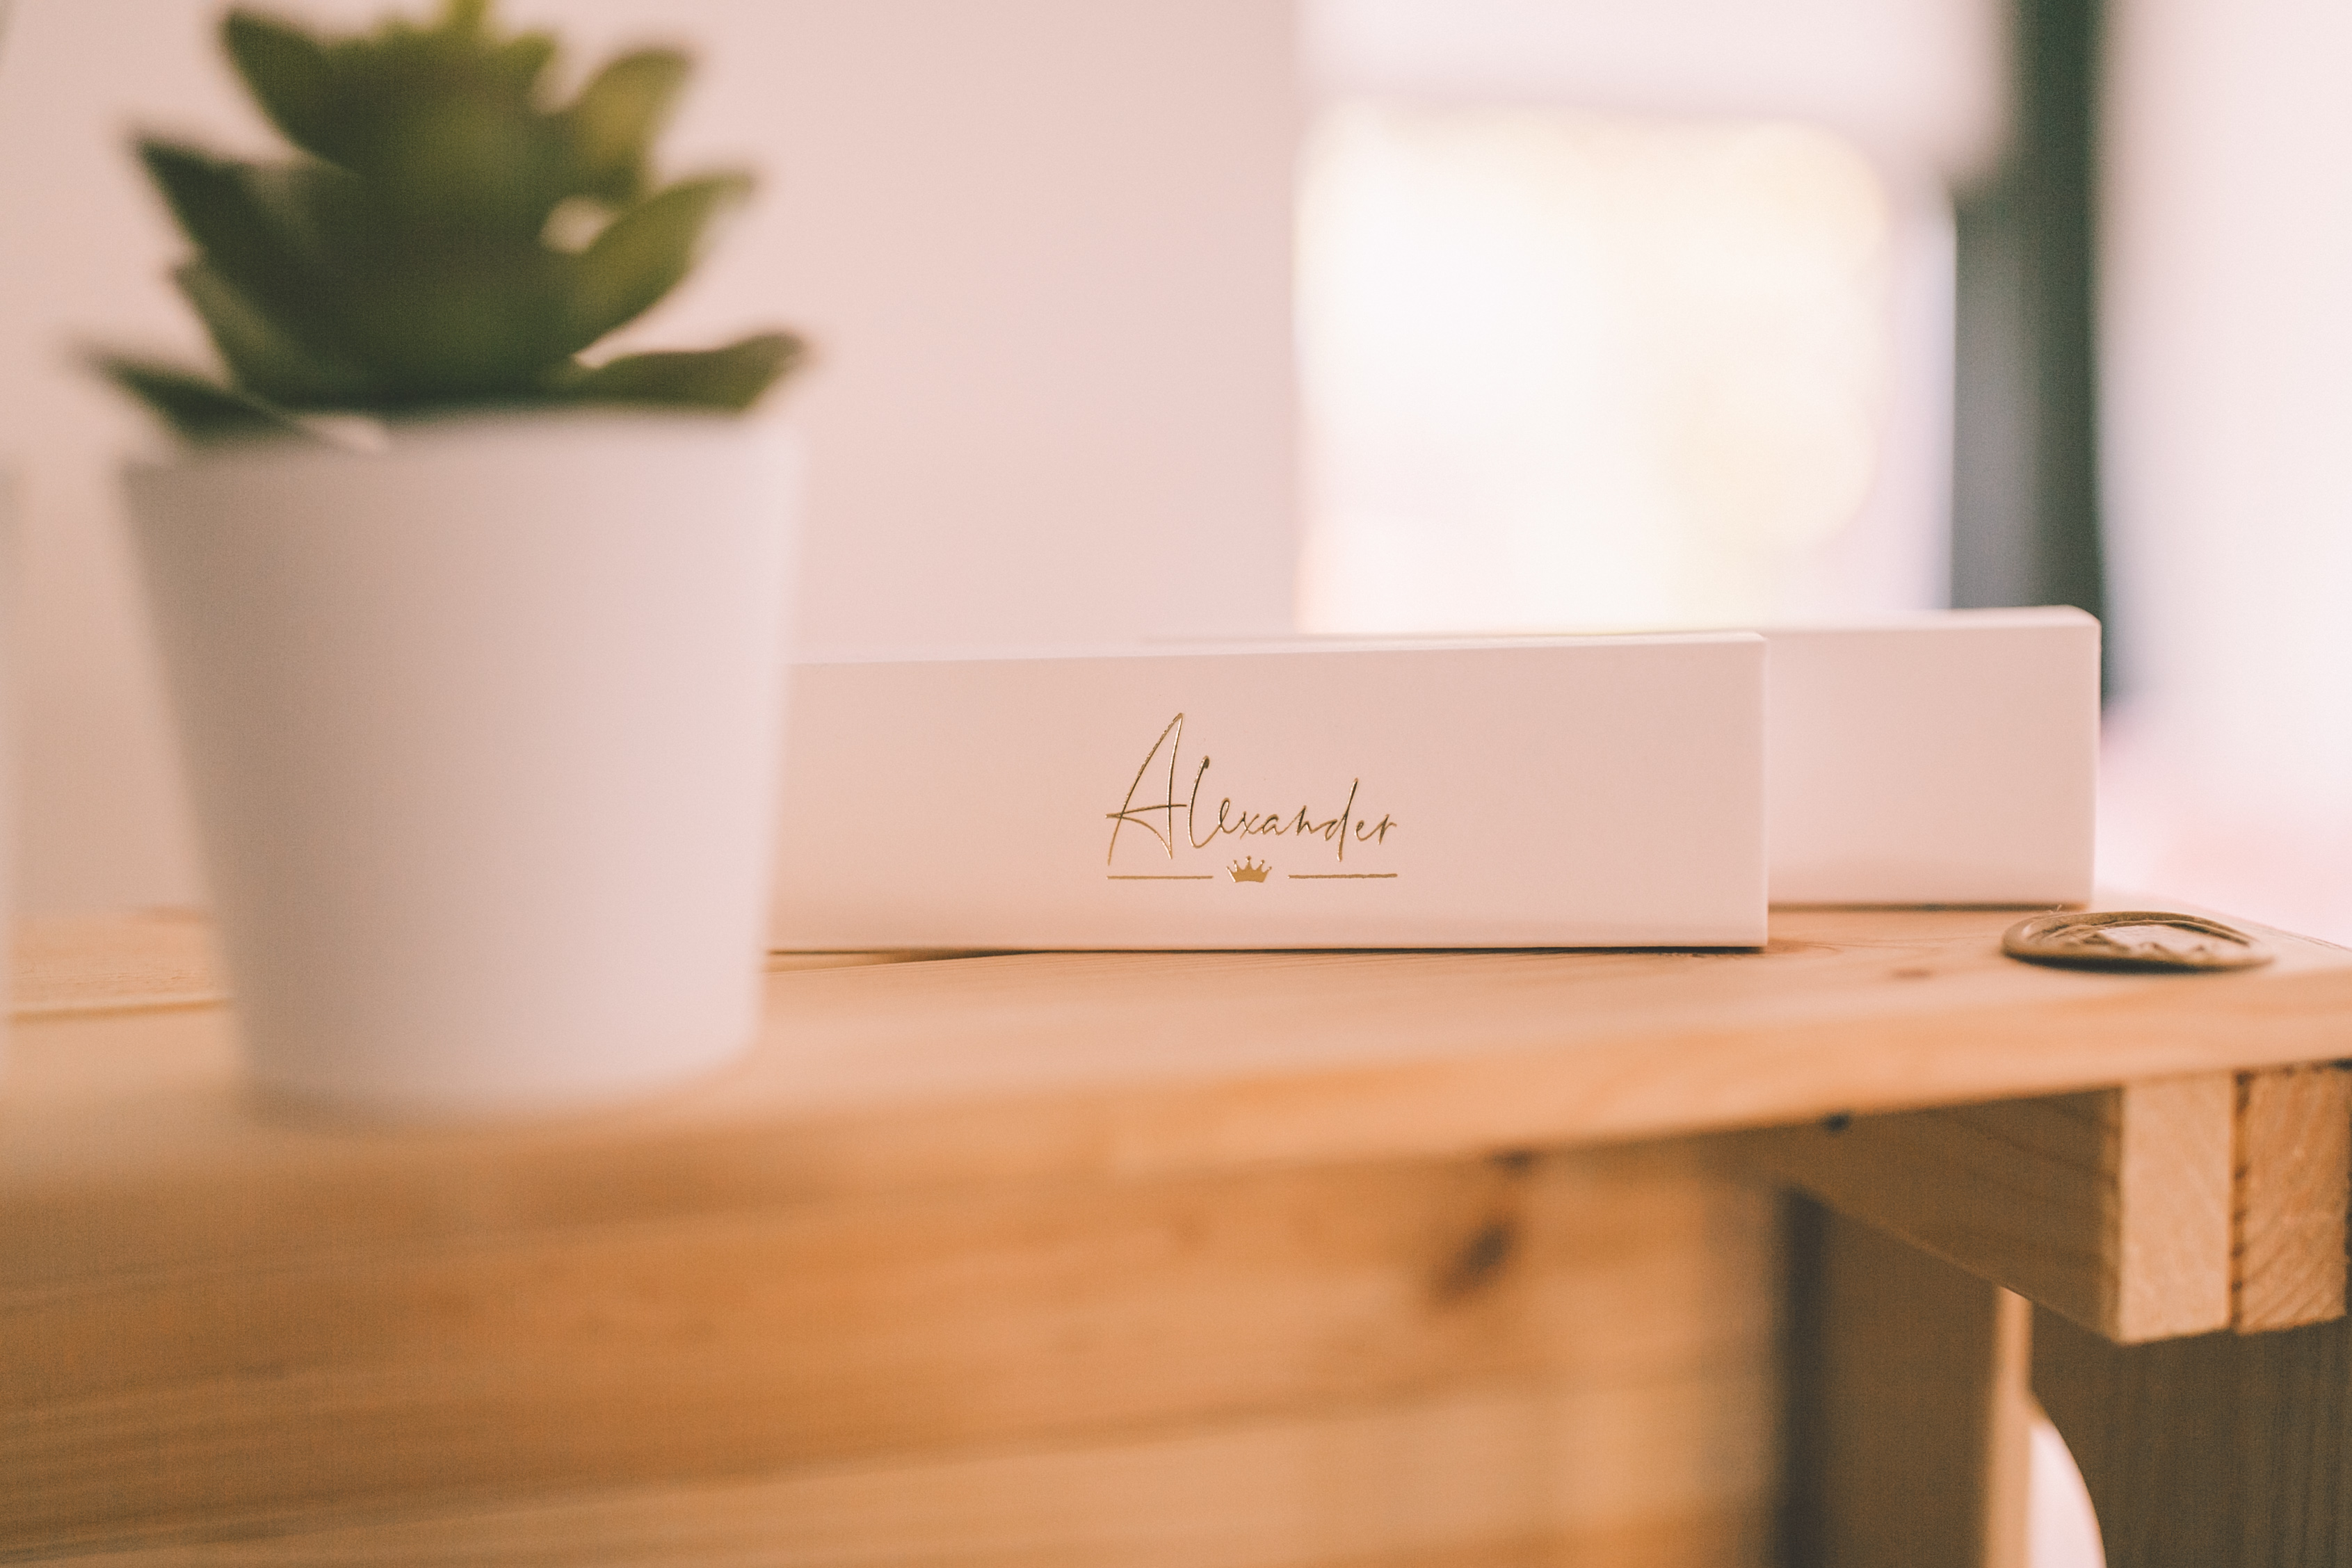 ALEXANDER-5894